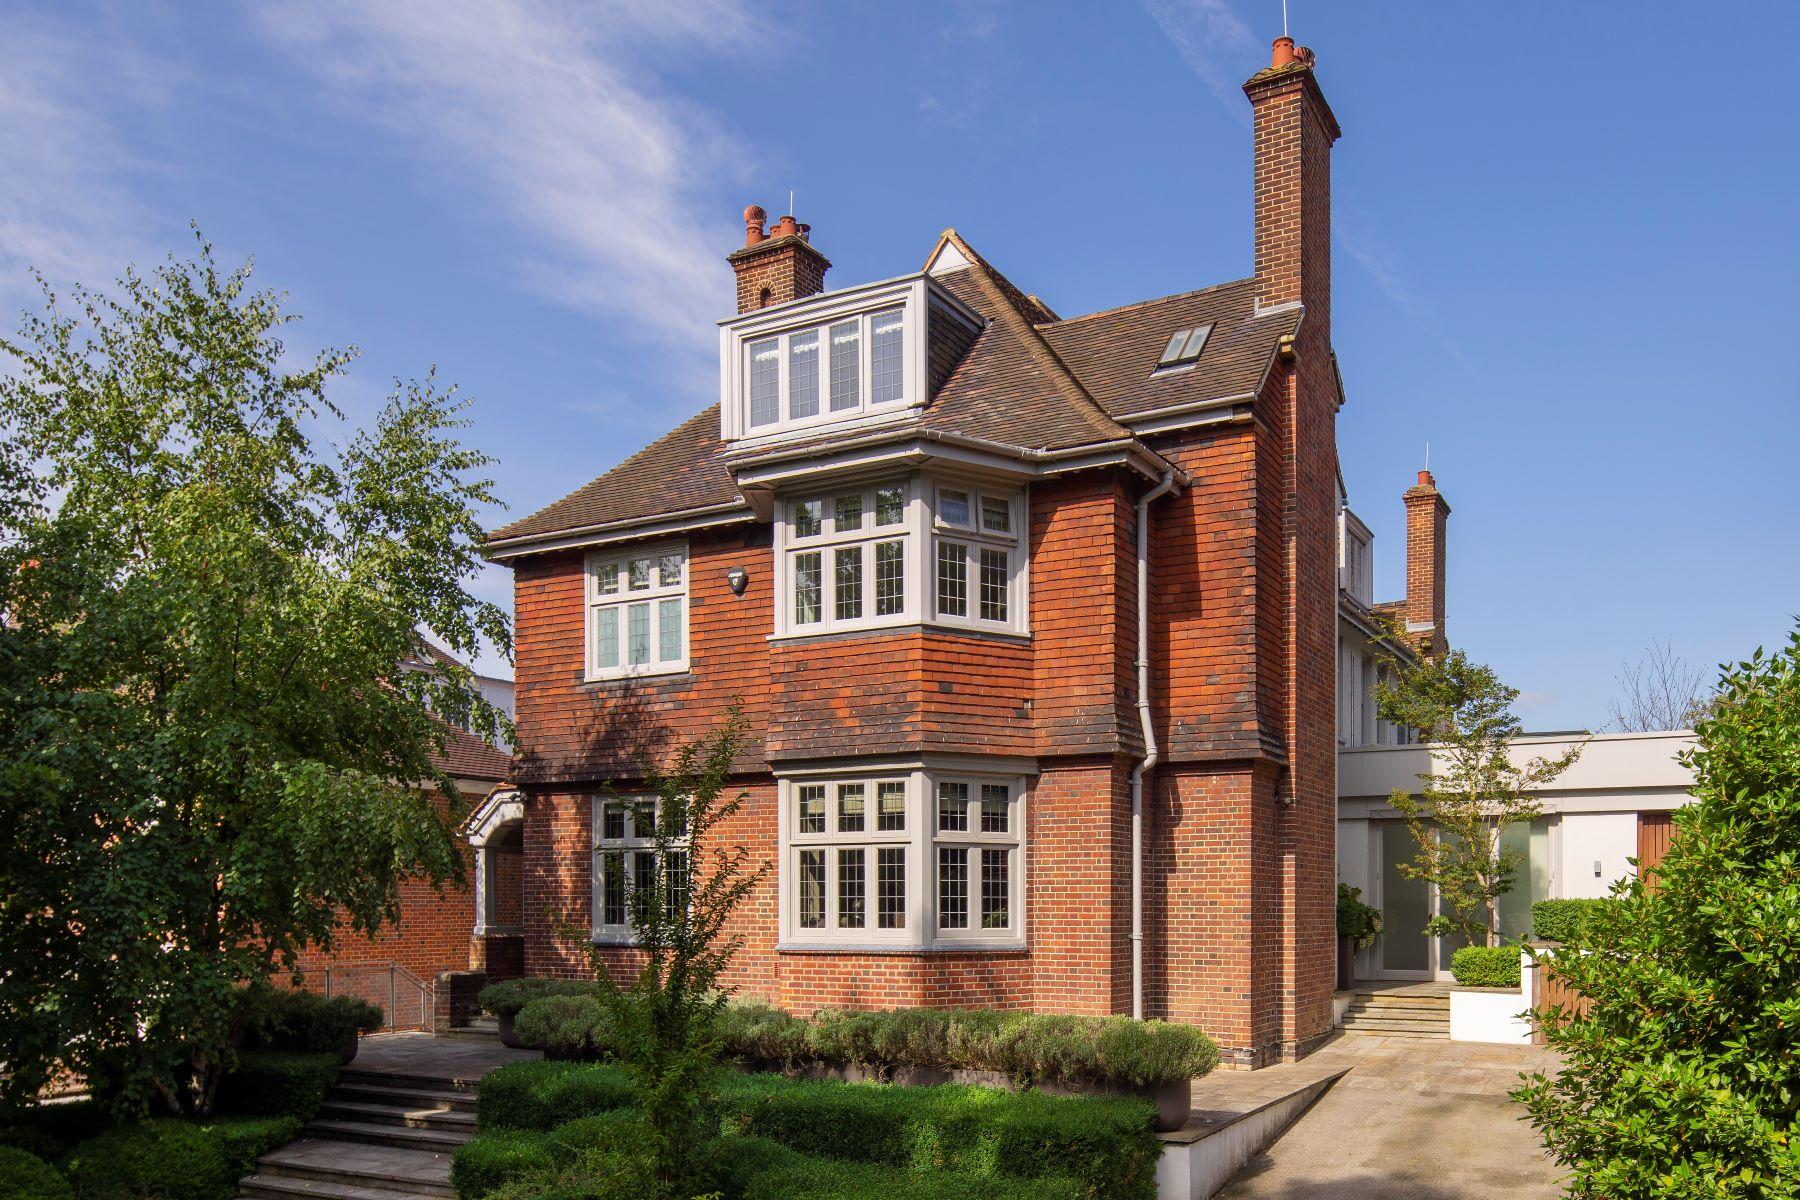 Single Family Home for Sale at Oakhill Avenue, Hampstead 12 Oakhill Avenue London, England NW3 7RE United Kingdom